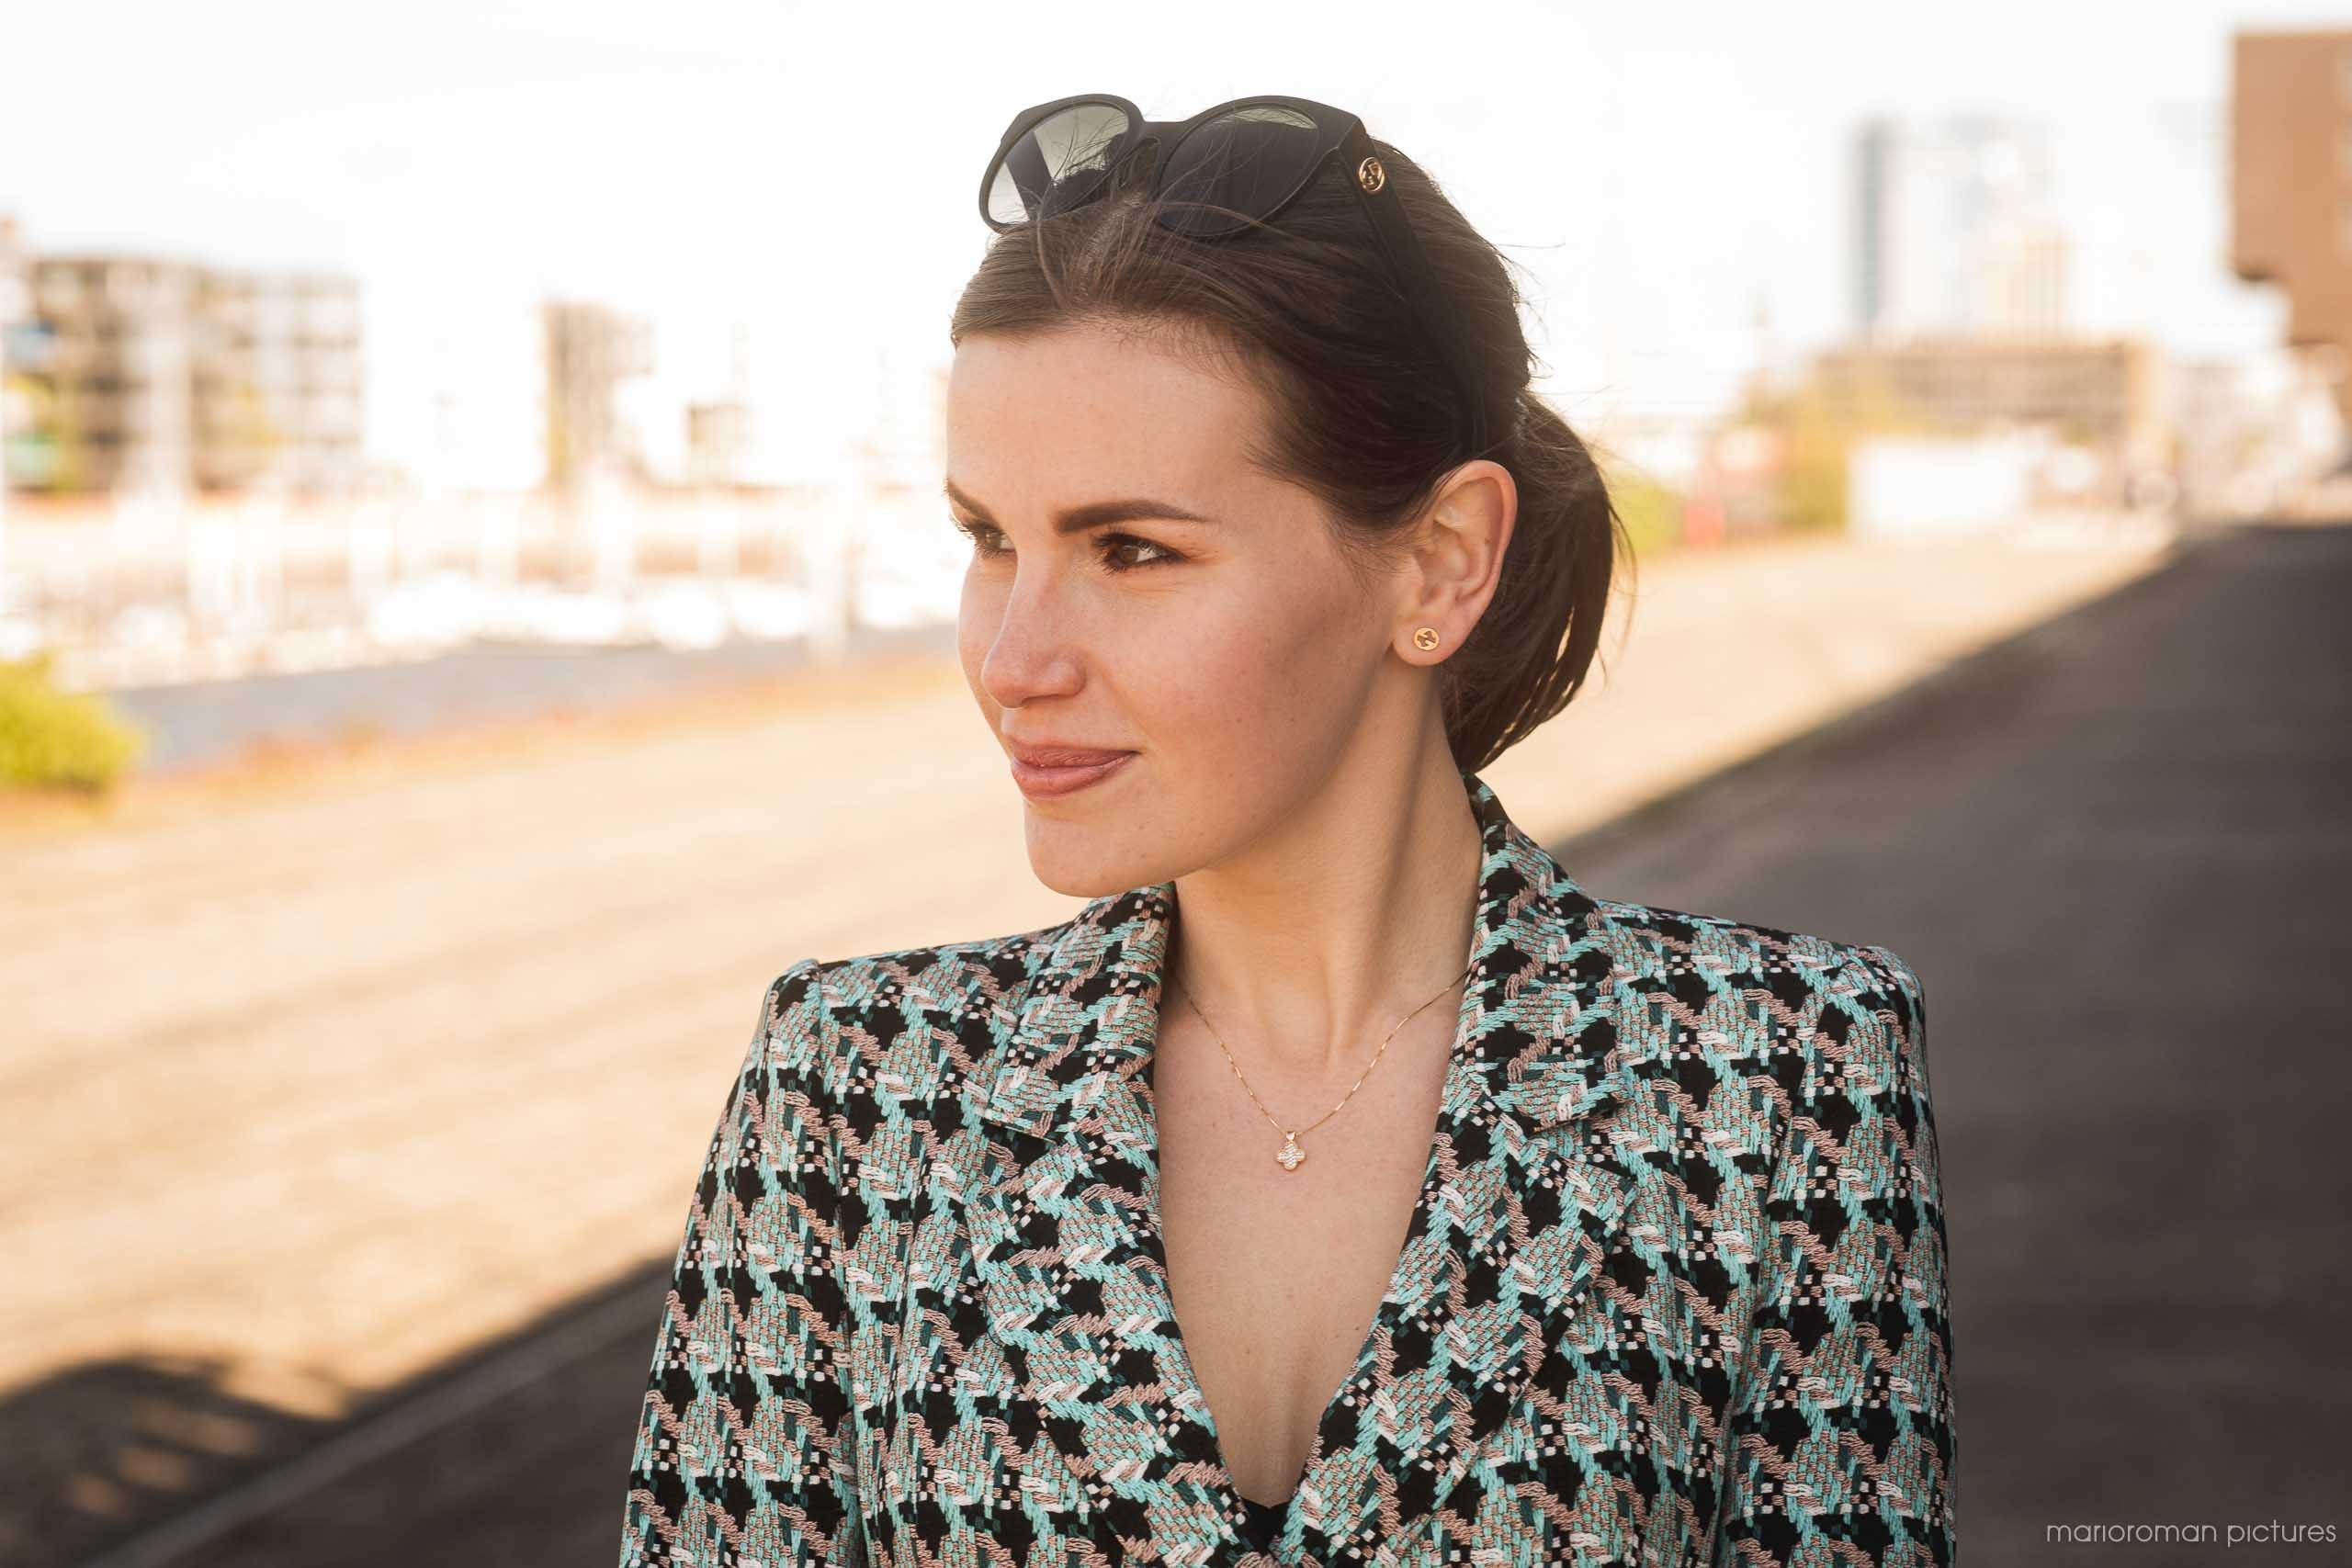 Natali Dujunov, Luxury Agent